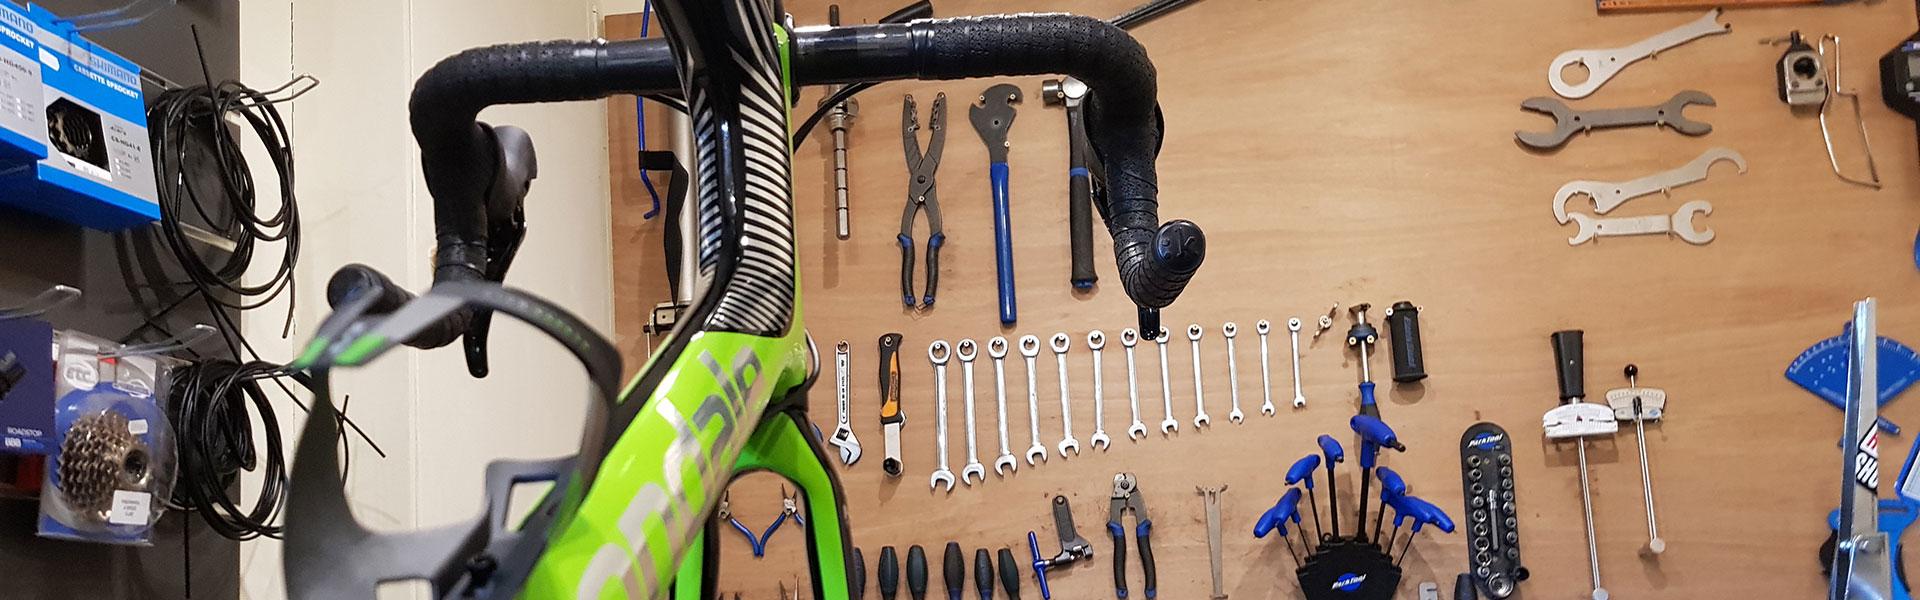 VeloElite Bike Servicing and Repairs